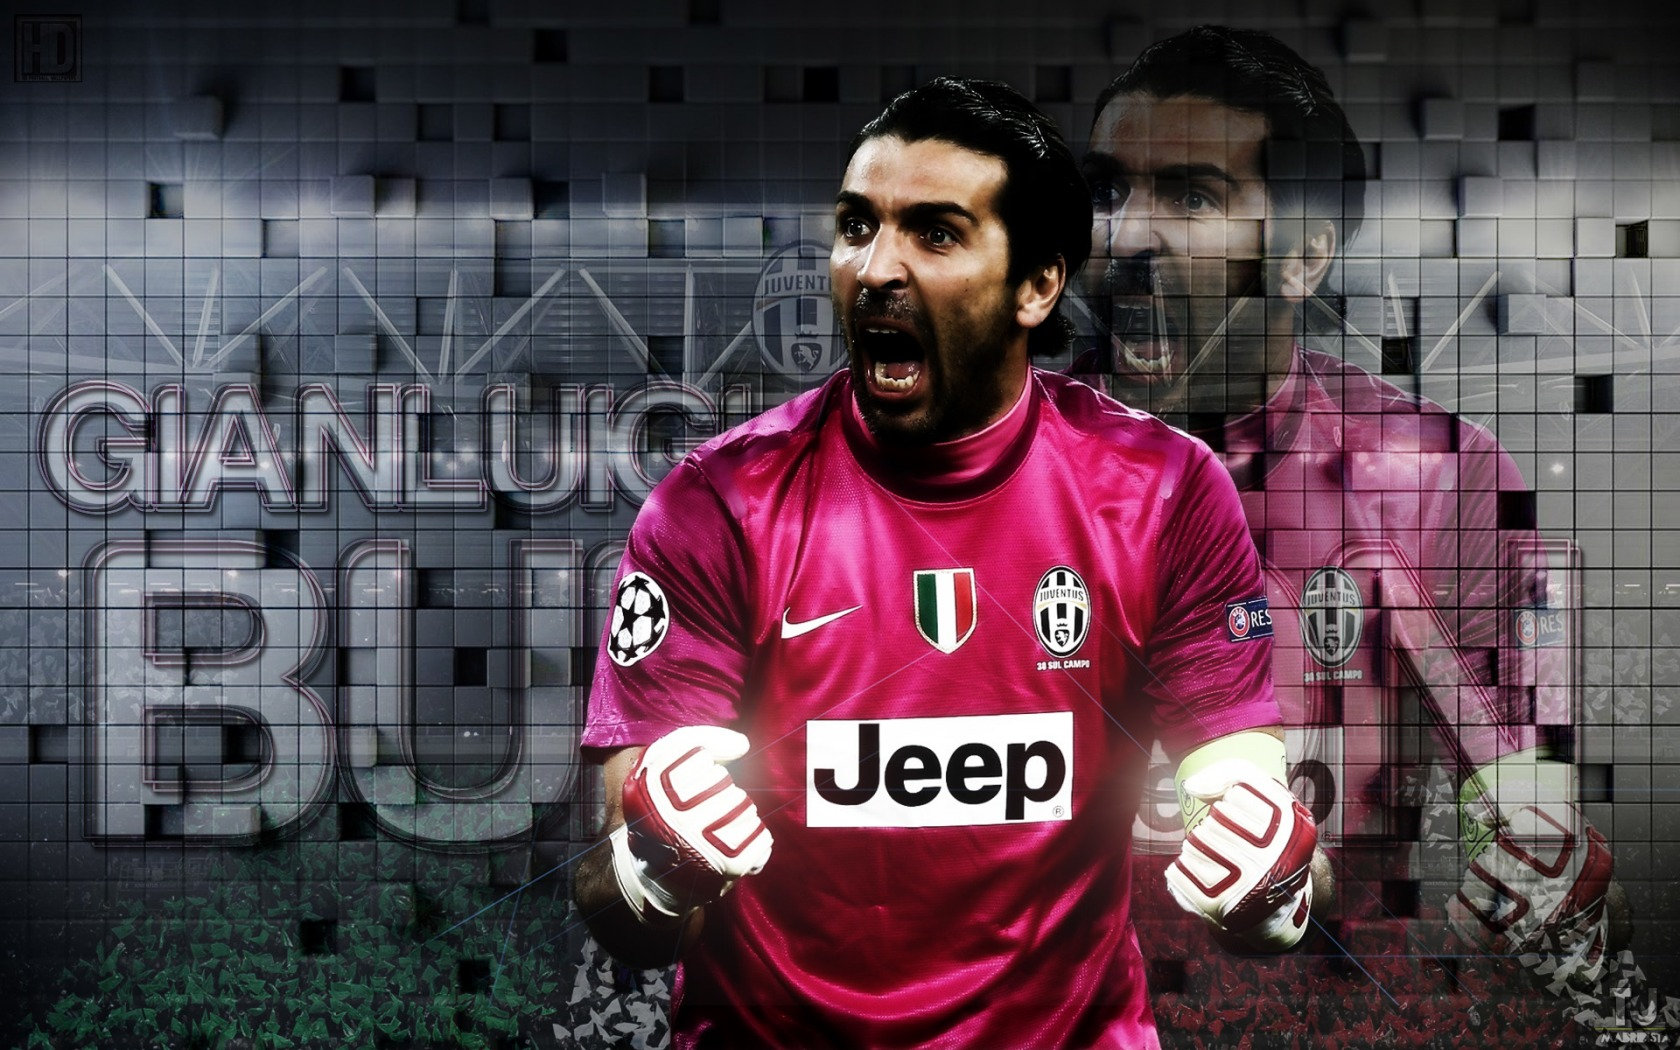 Download gianluigi buffon football player juventus 1280x800 download original voltagebd Image collections